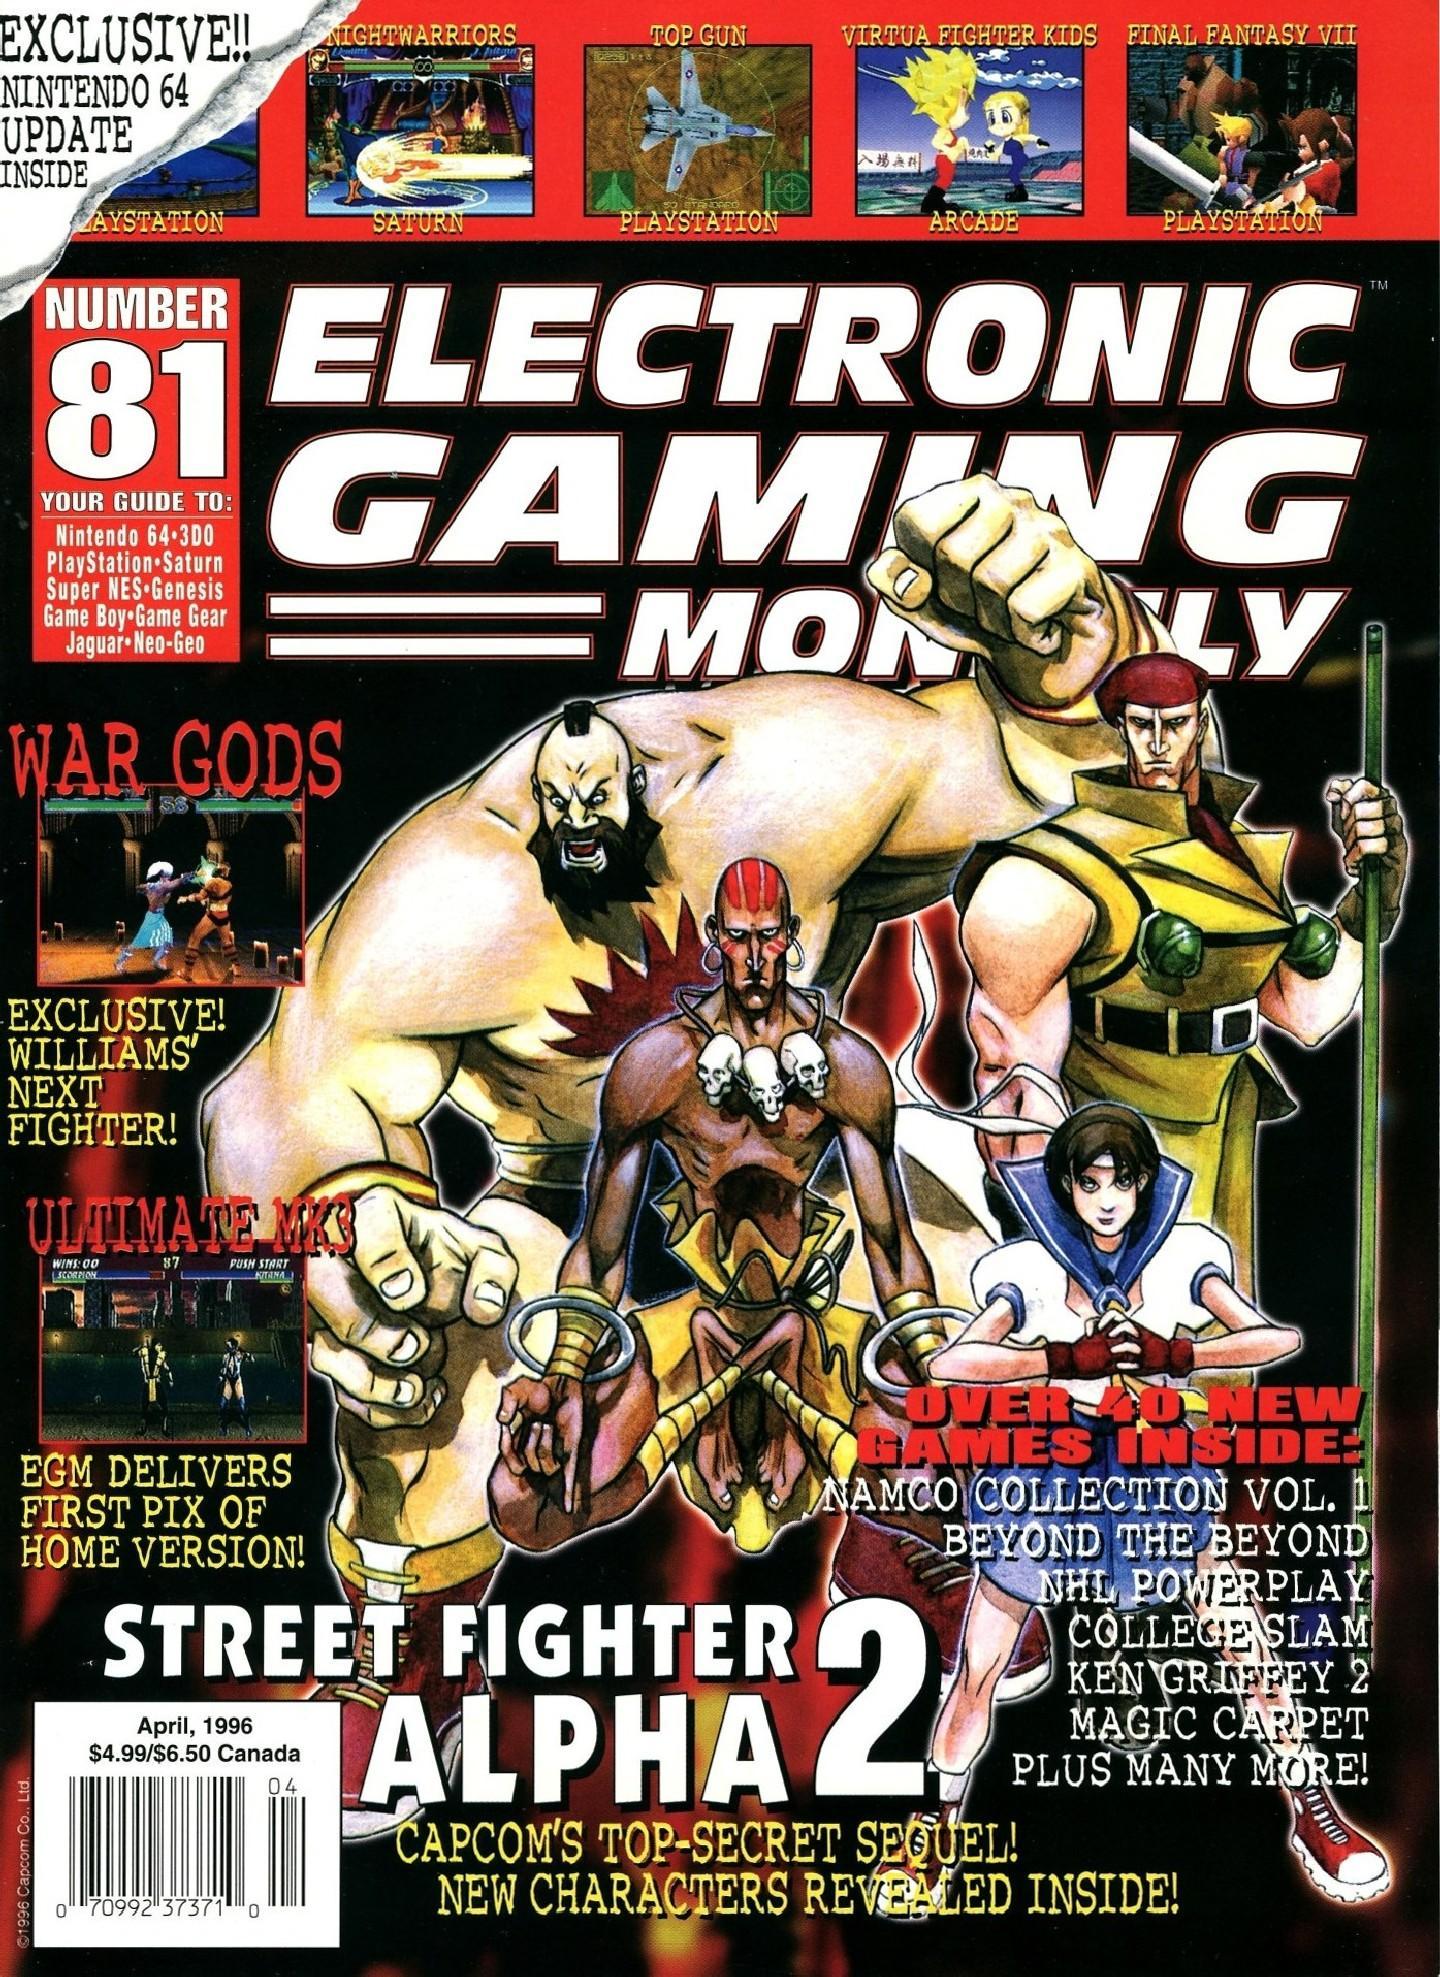 Cover for EGM #81